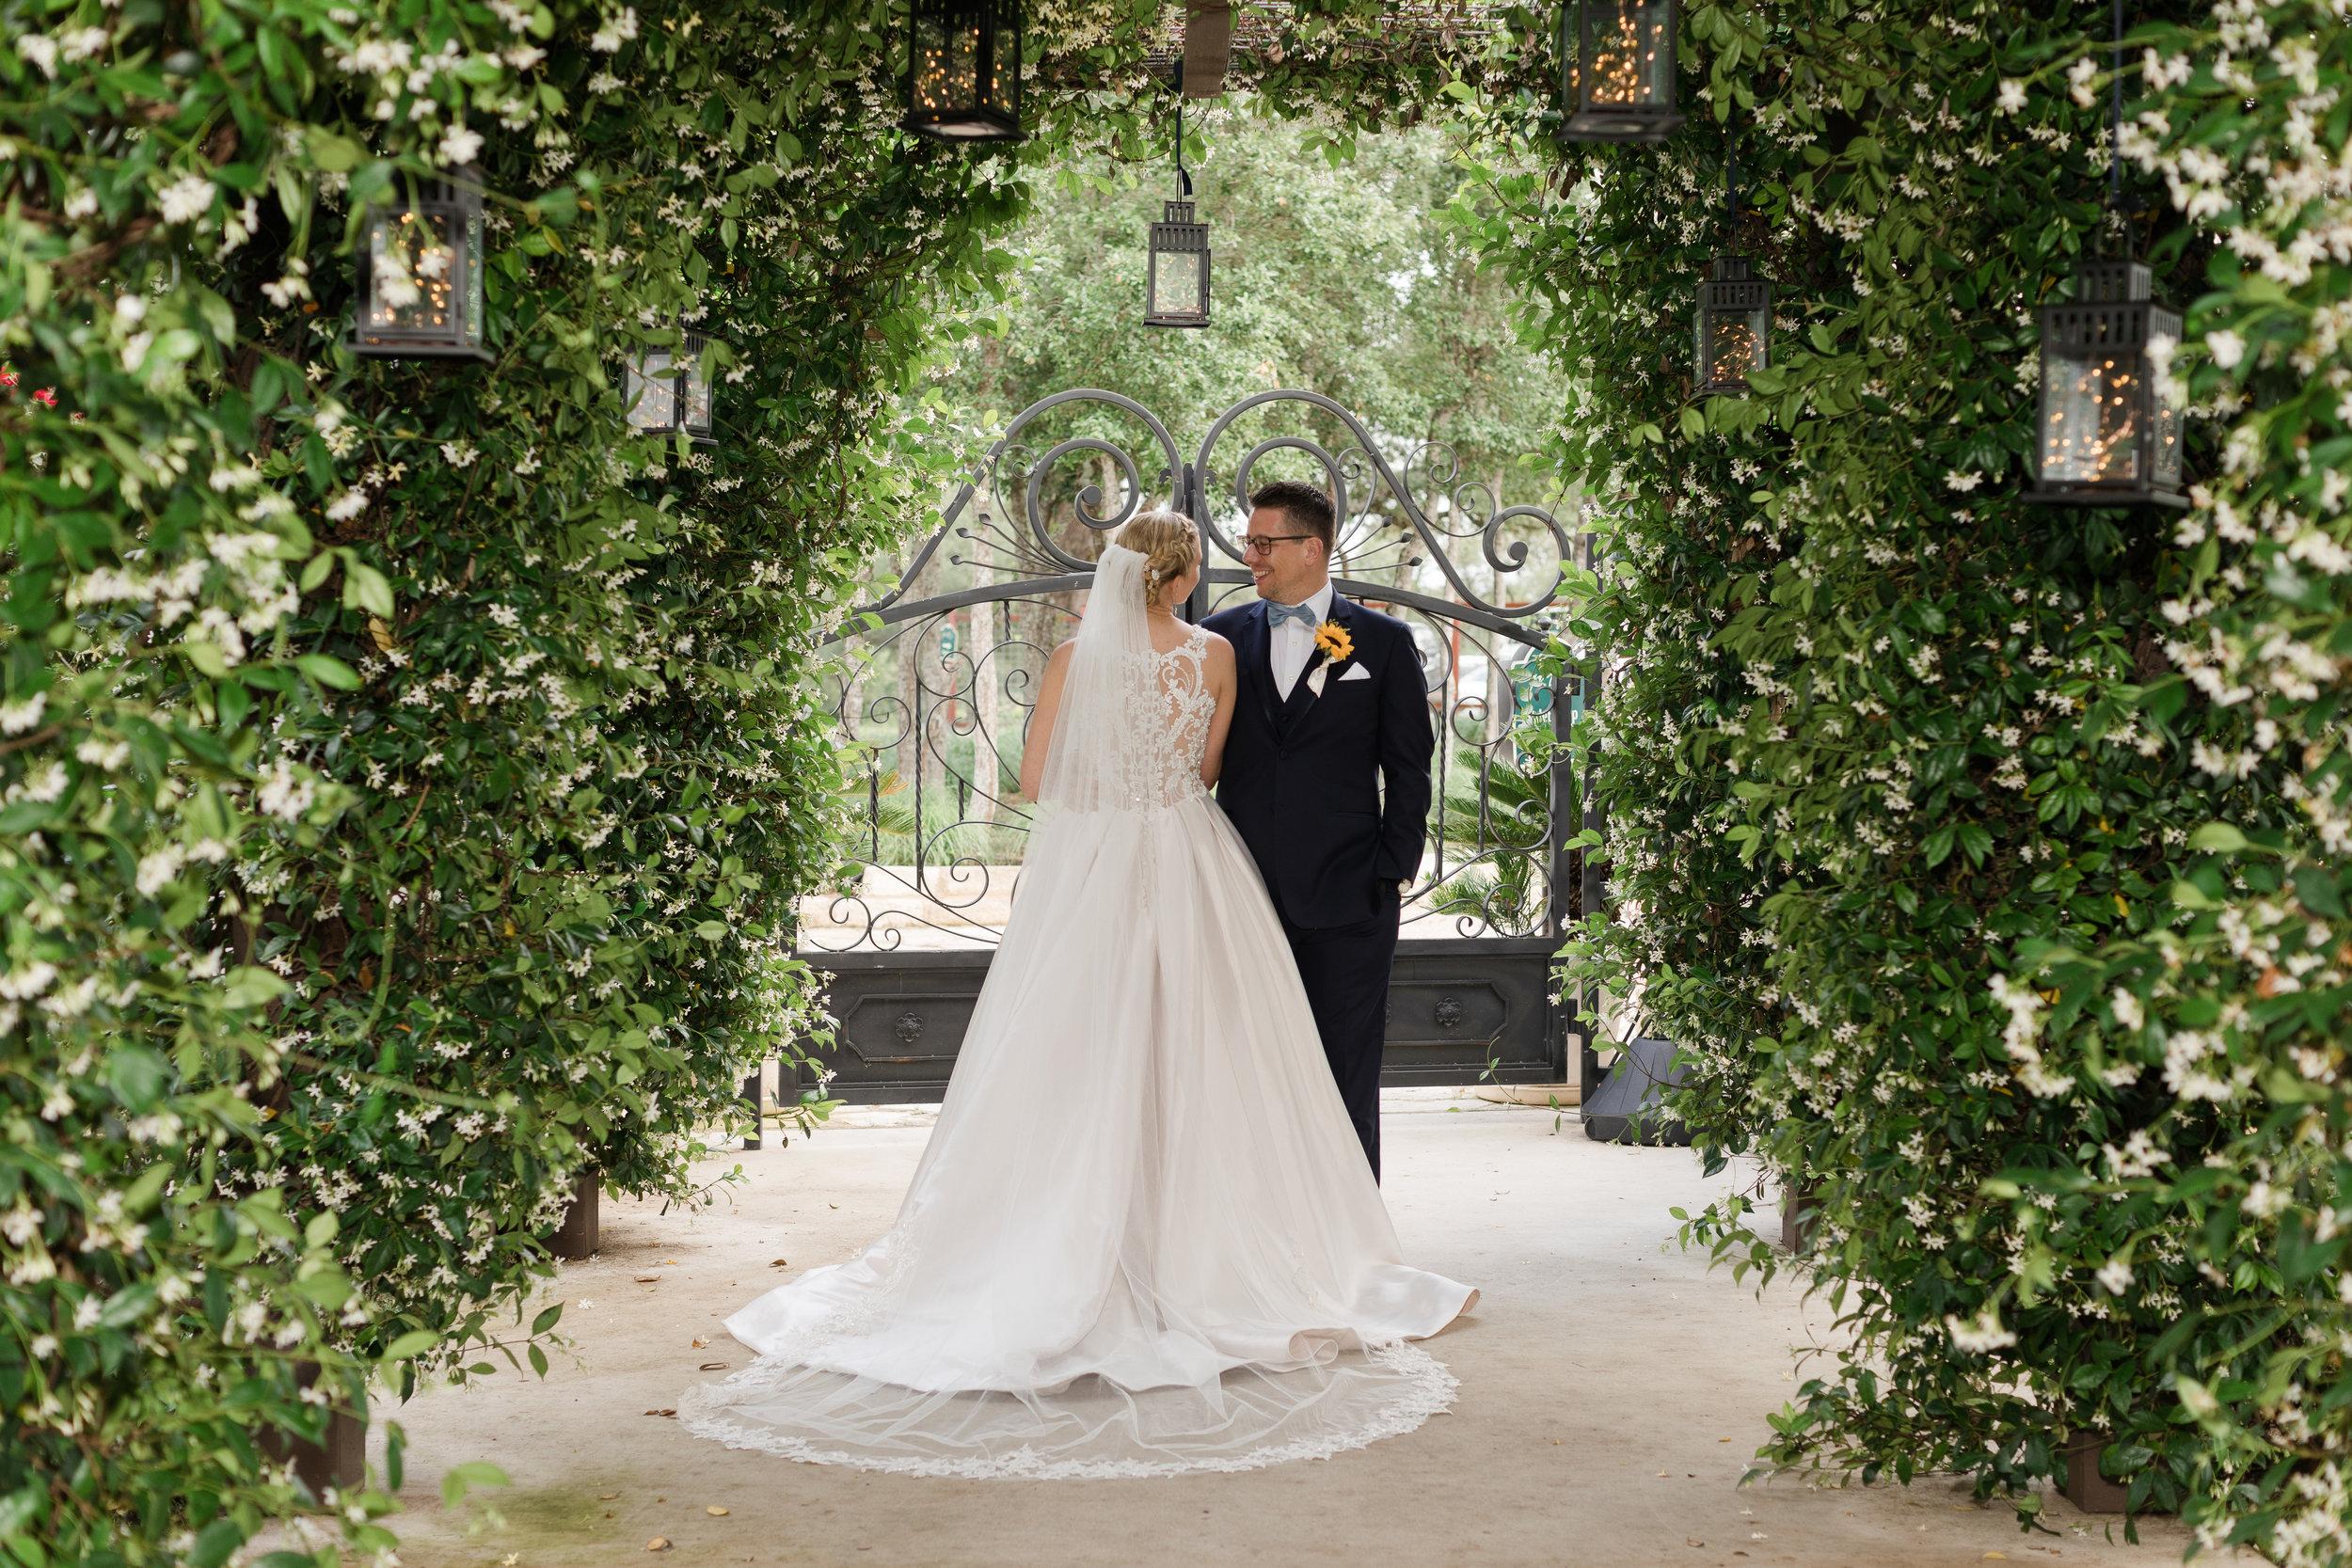 Laufs-Wedding-557.jpg